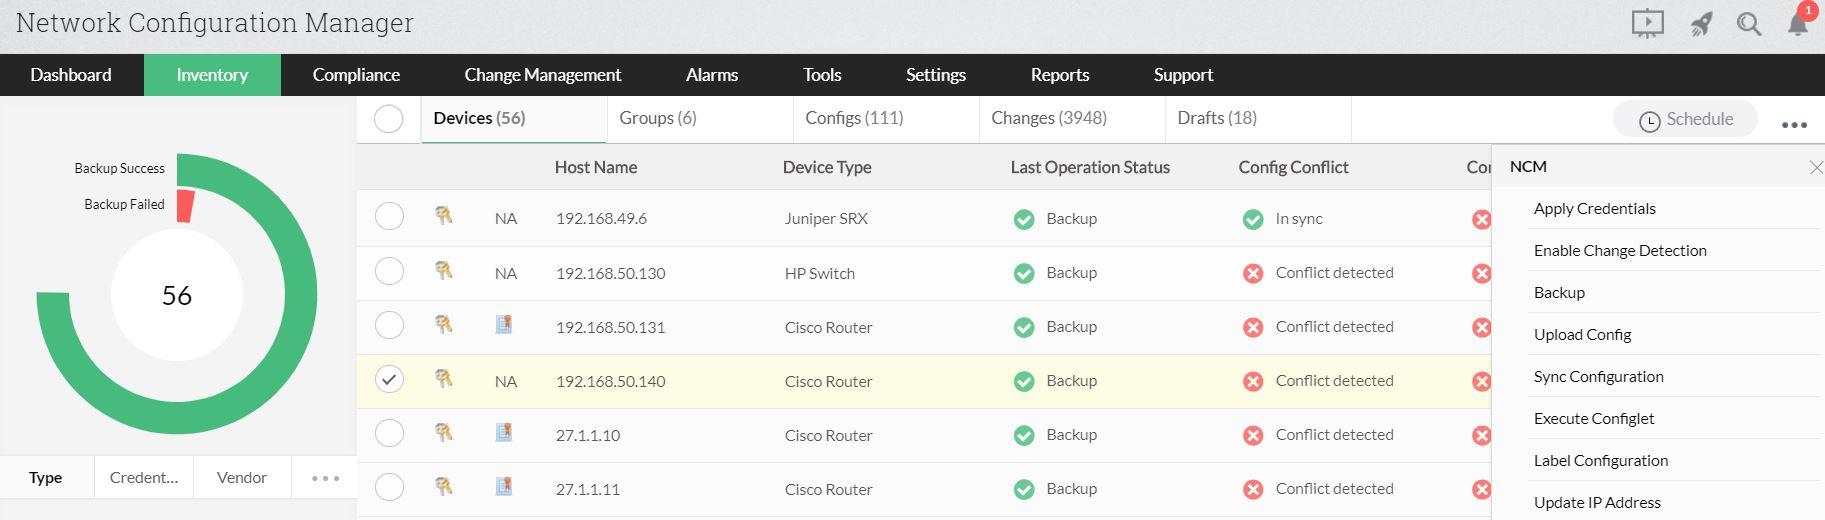 Network Config Backup Software - ManageEngine Network Configuration Manager